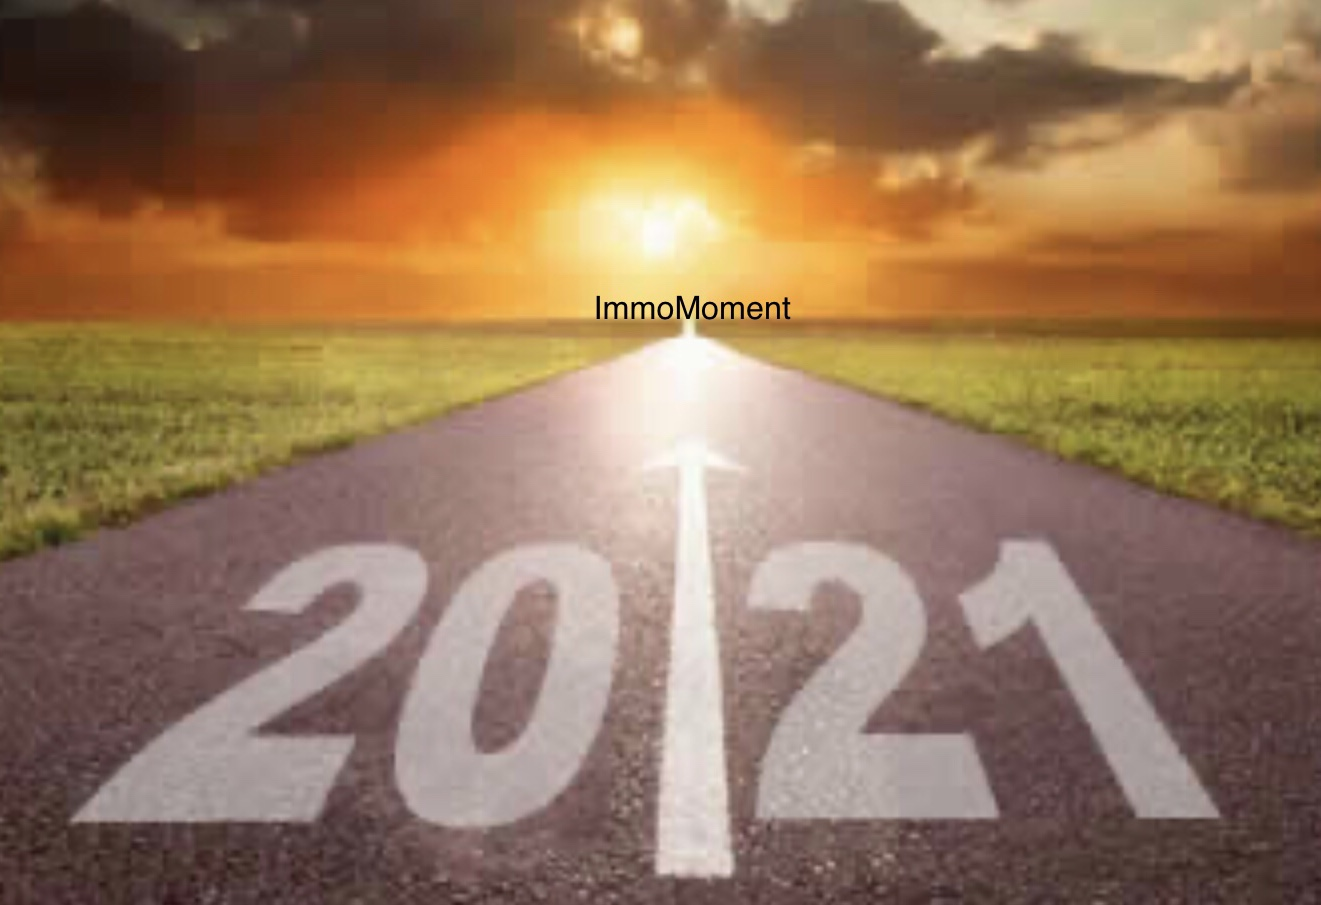 26 DEC 2020